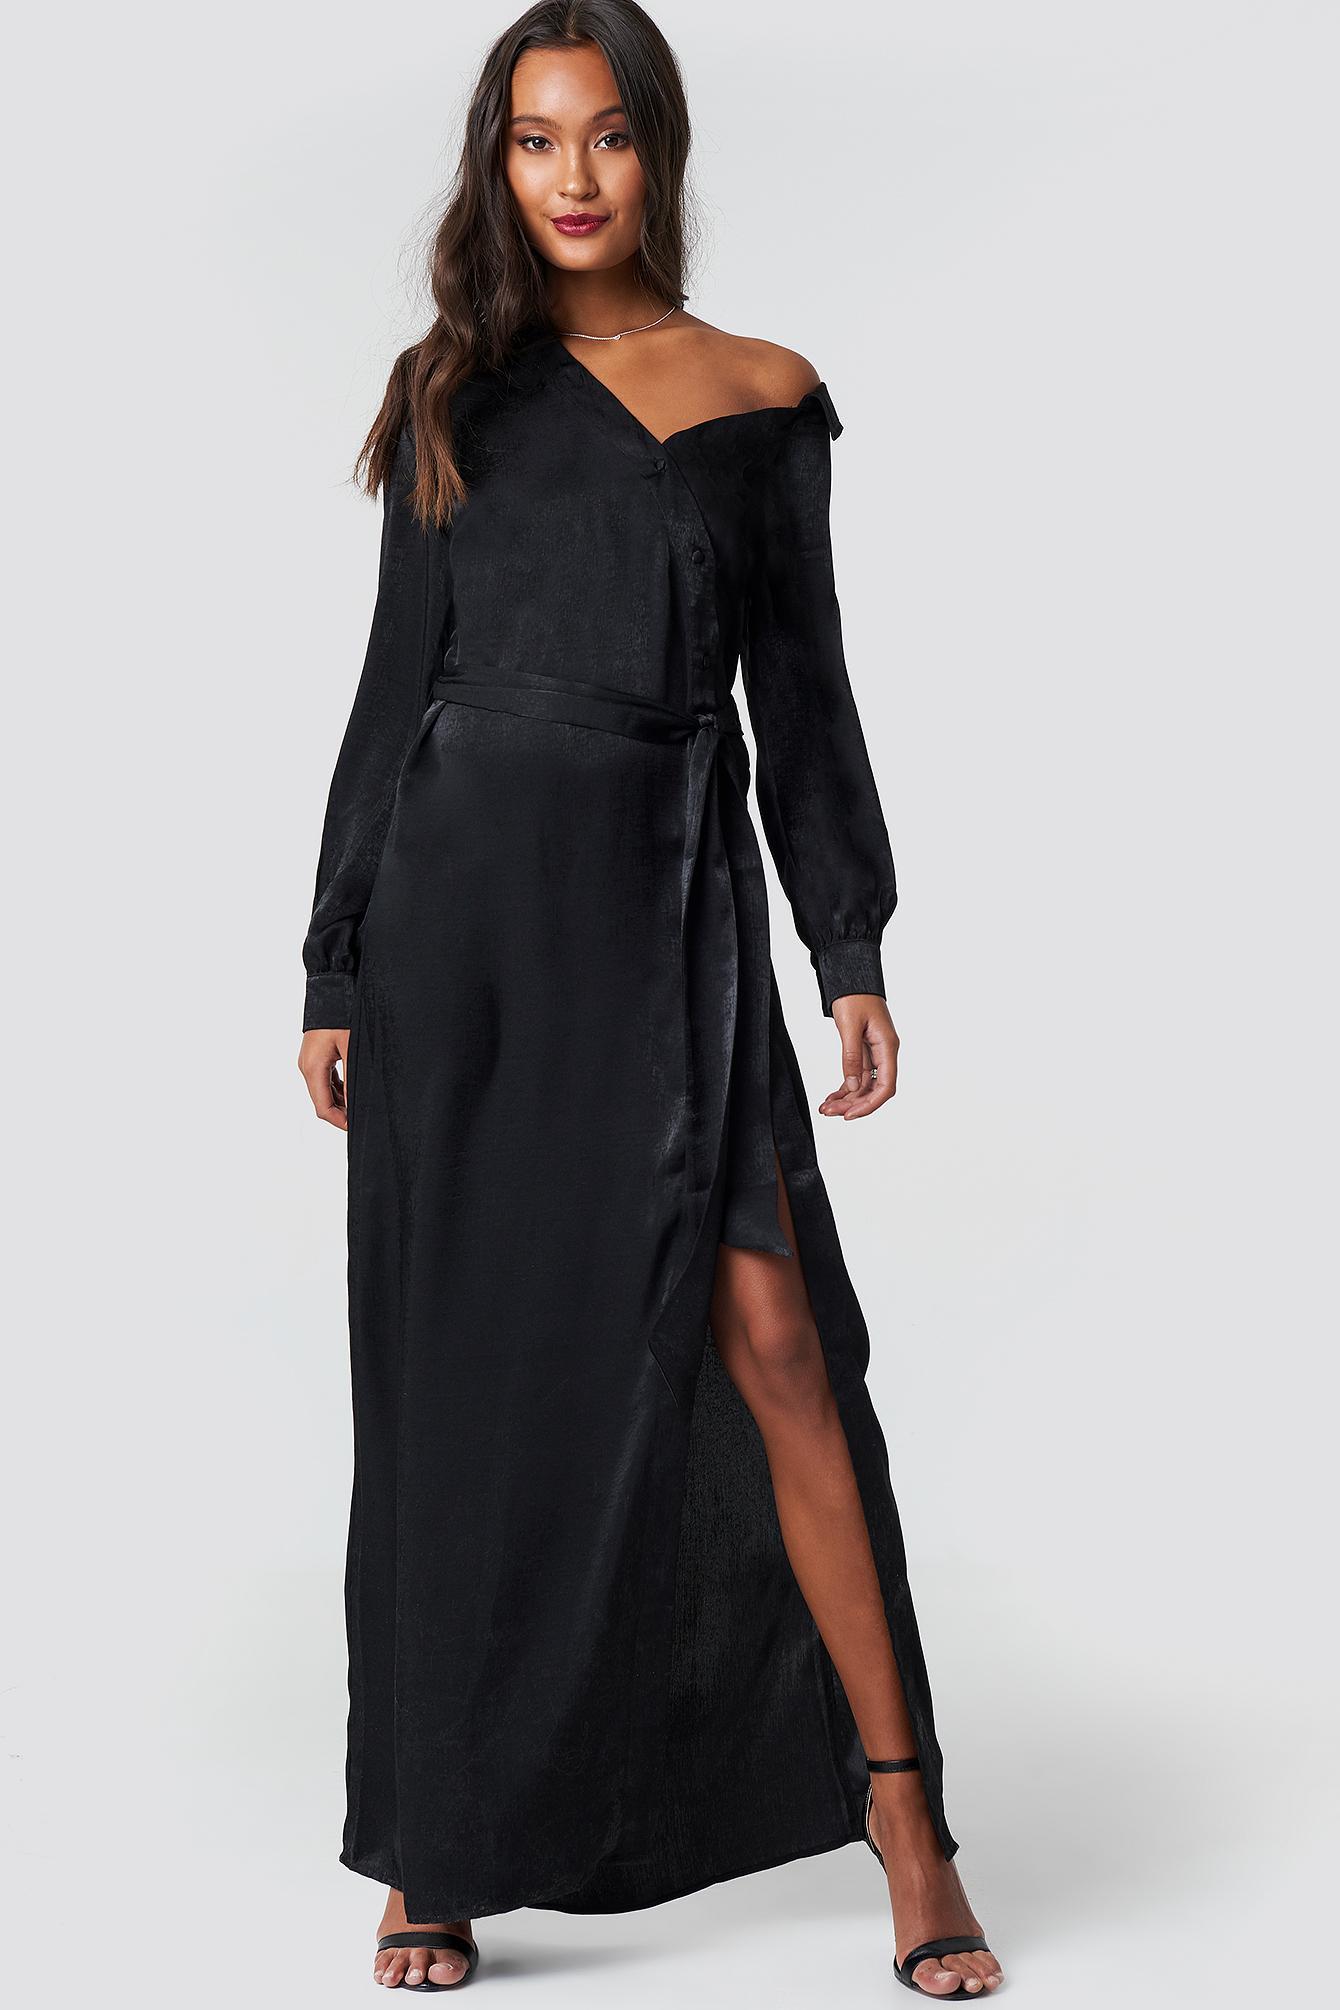 43bcecdbdcc8f Lyst - NA-KD Slip Shoulder Tie Waist Shirt Black in Black